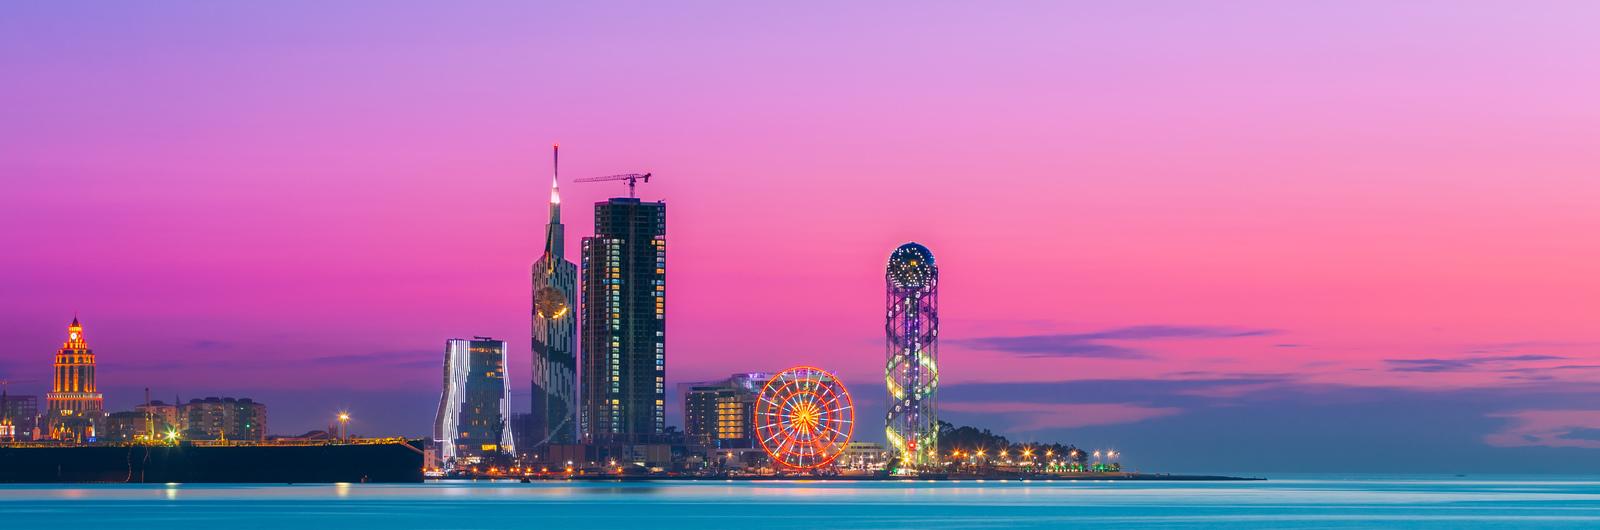 batumi city header